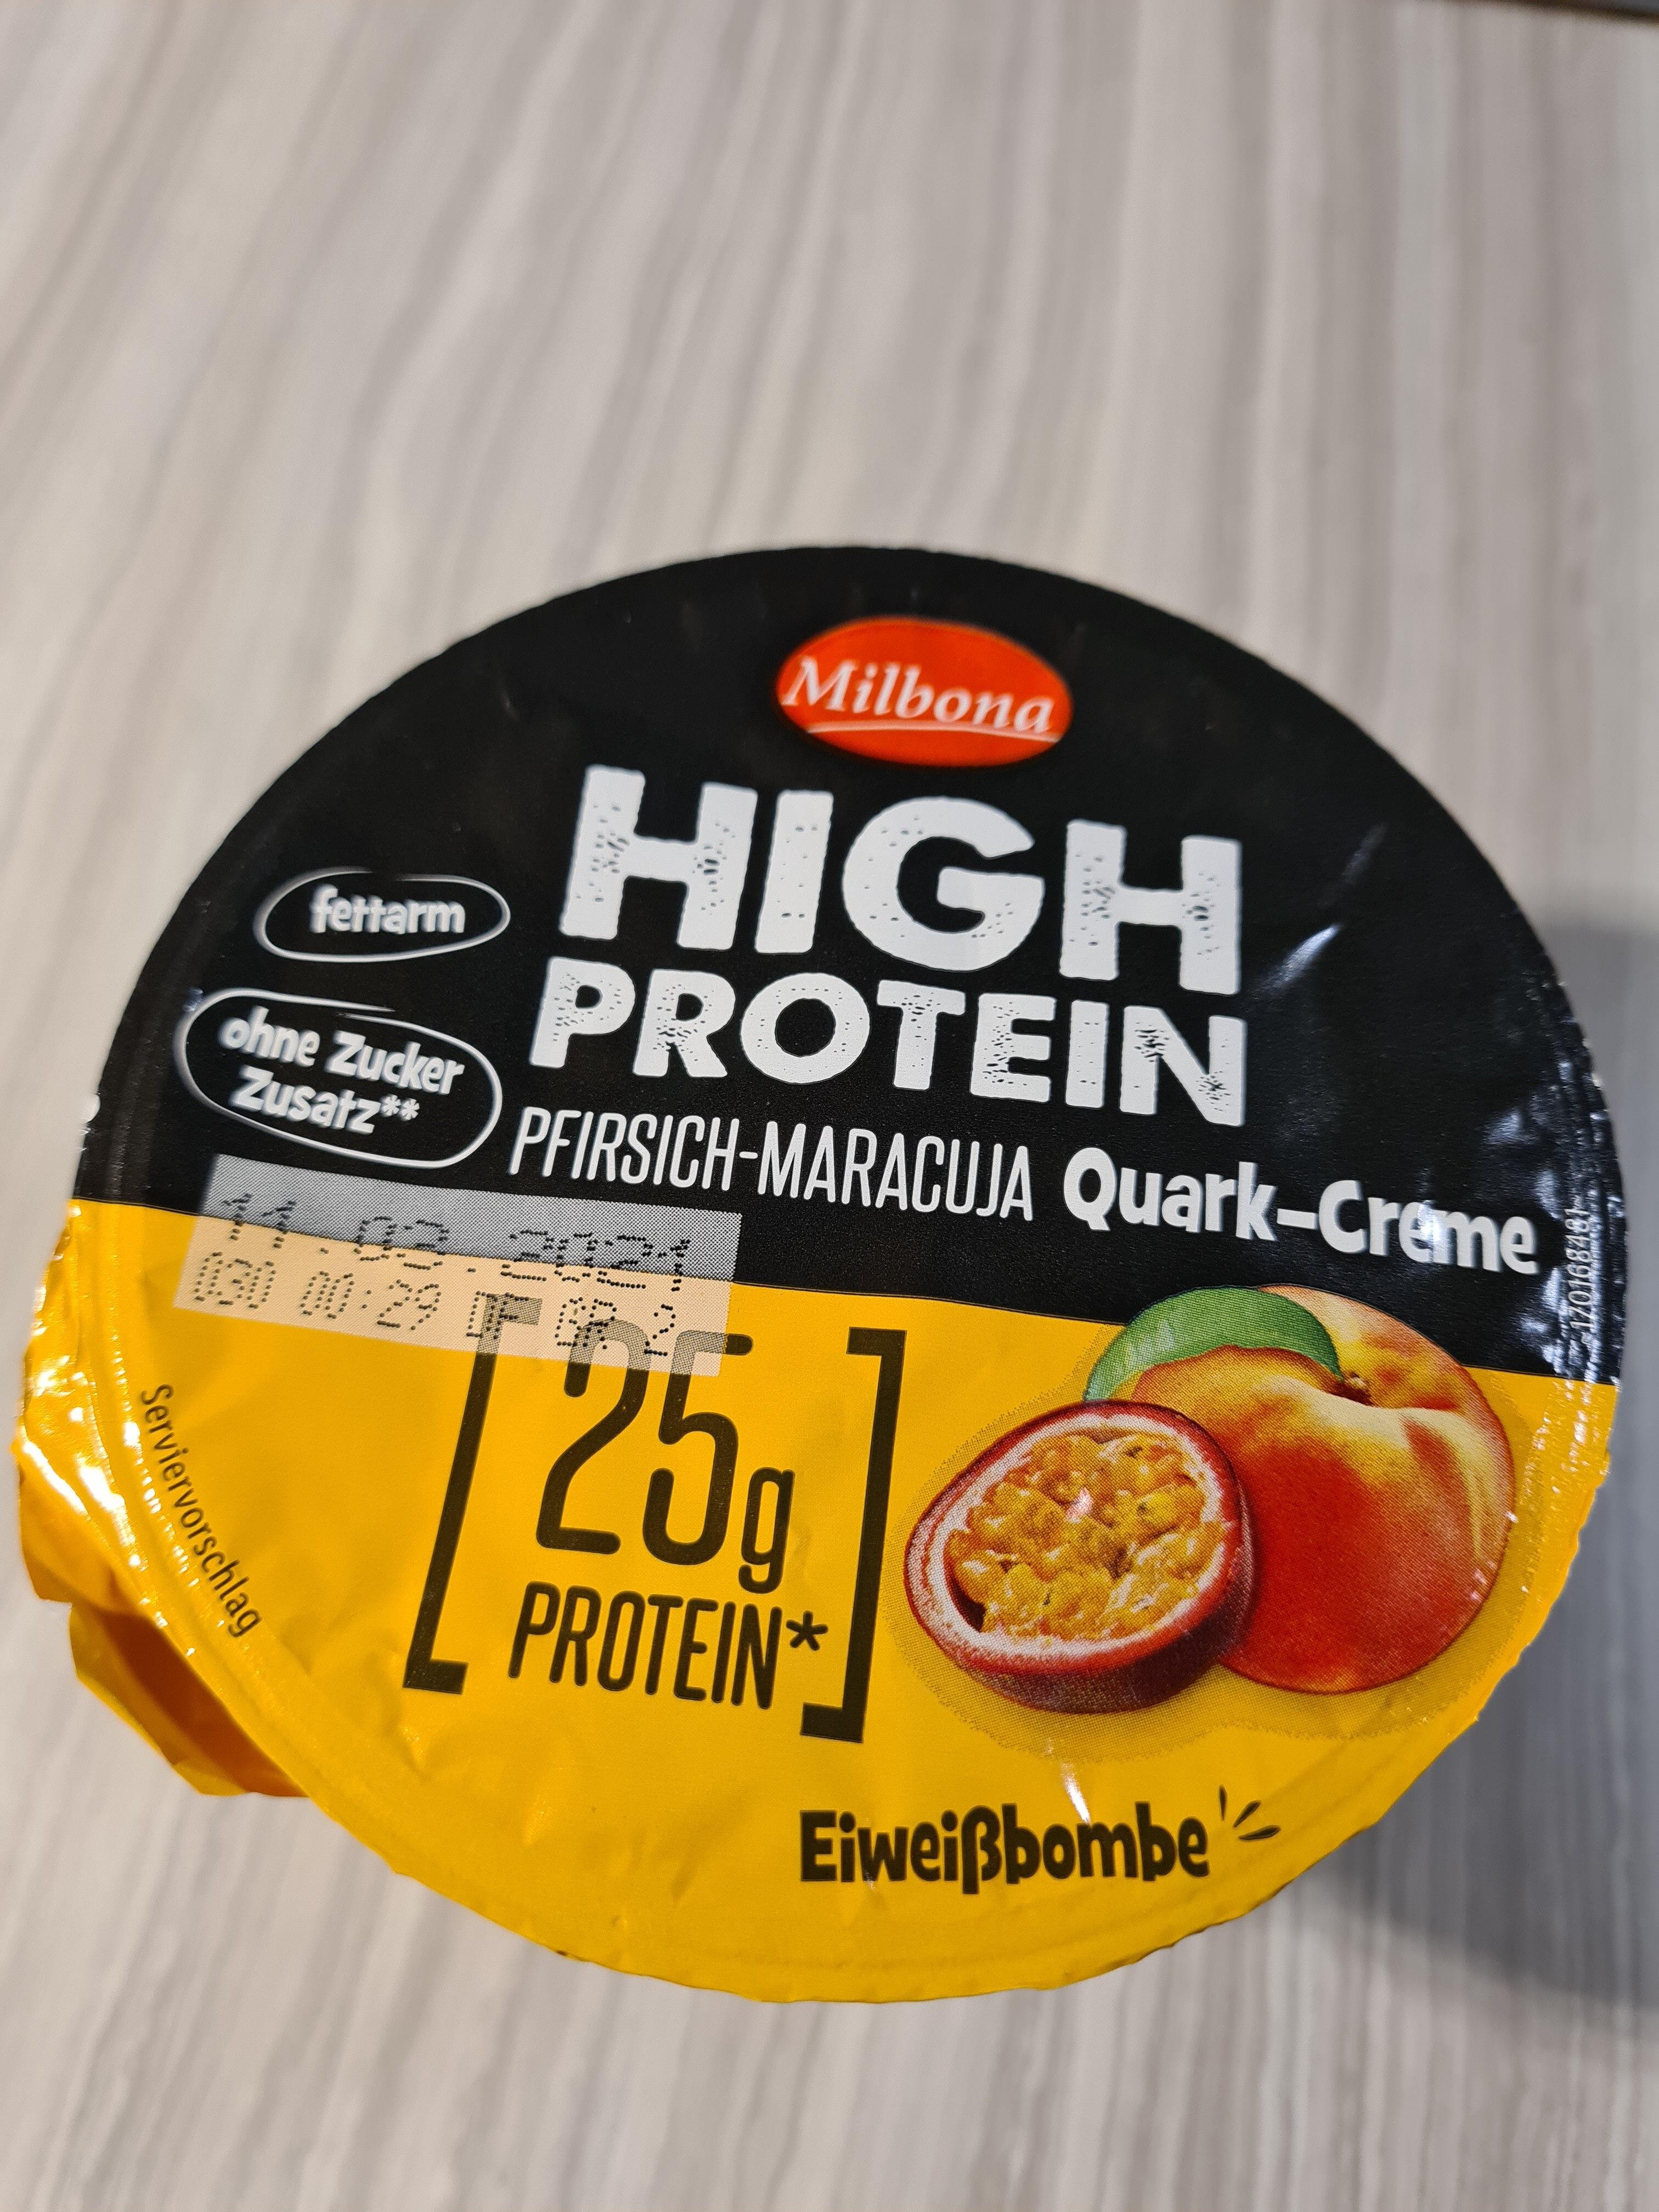 High protein Pfirsich-Maracuja Quark-Creme - Product - de